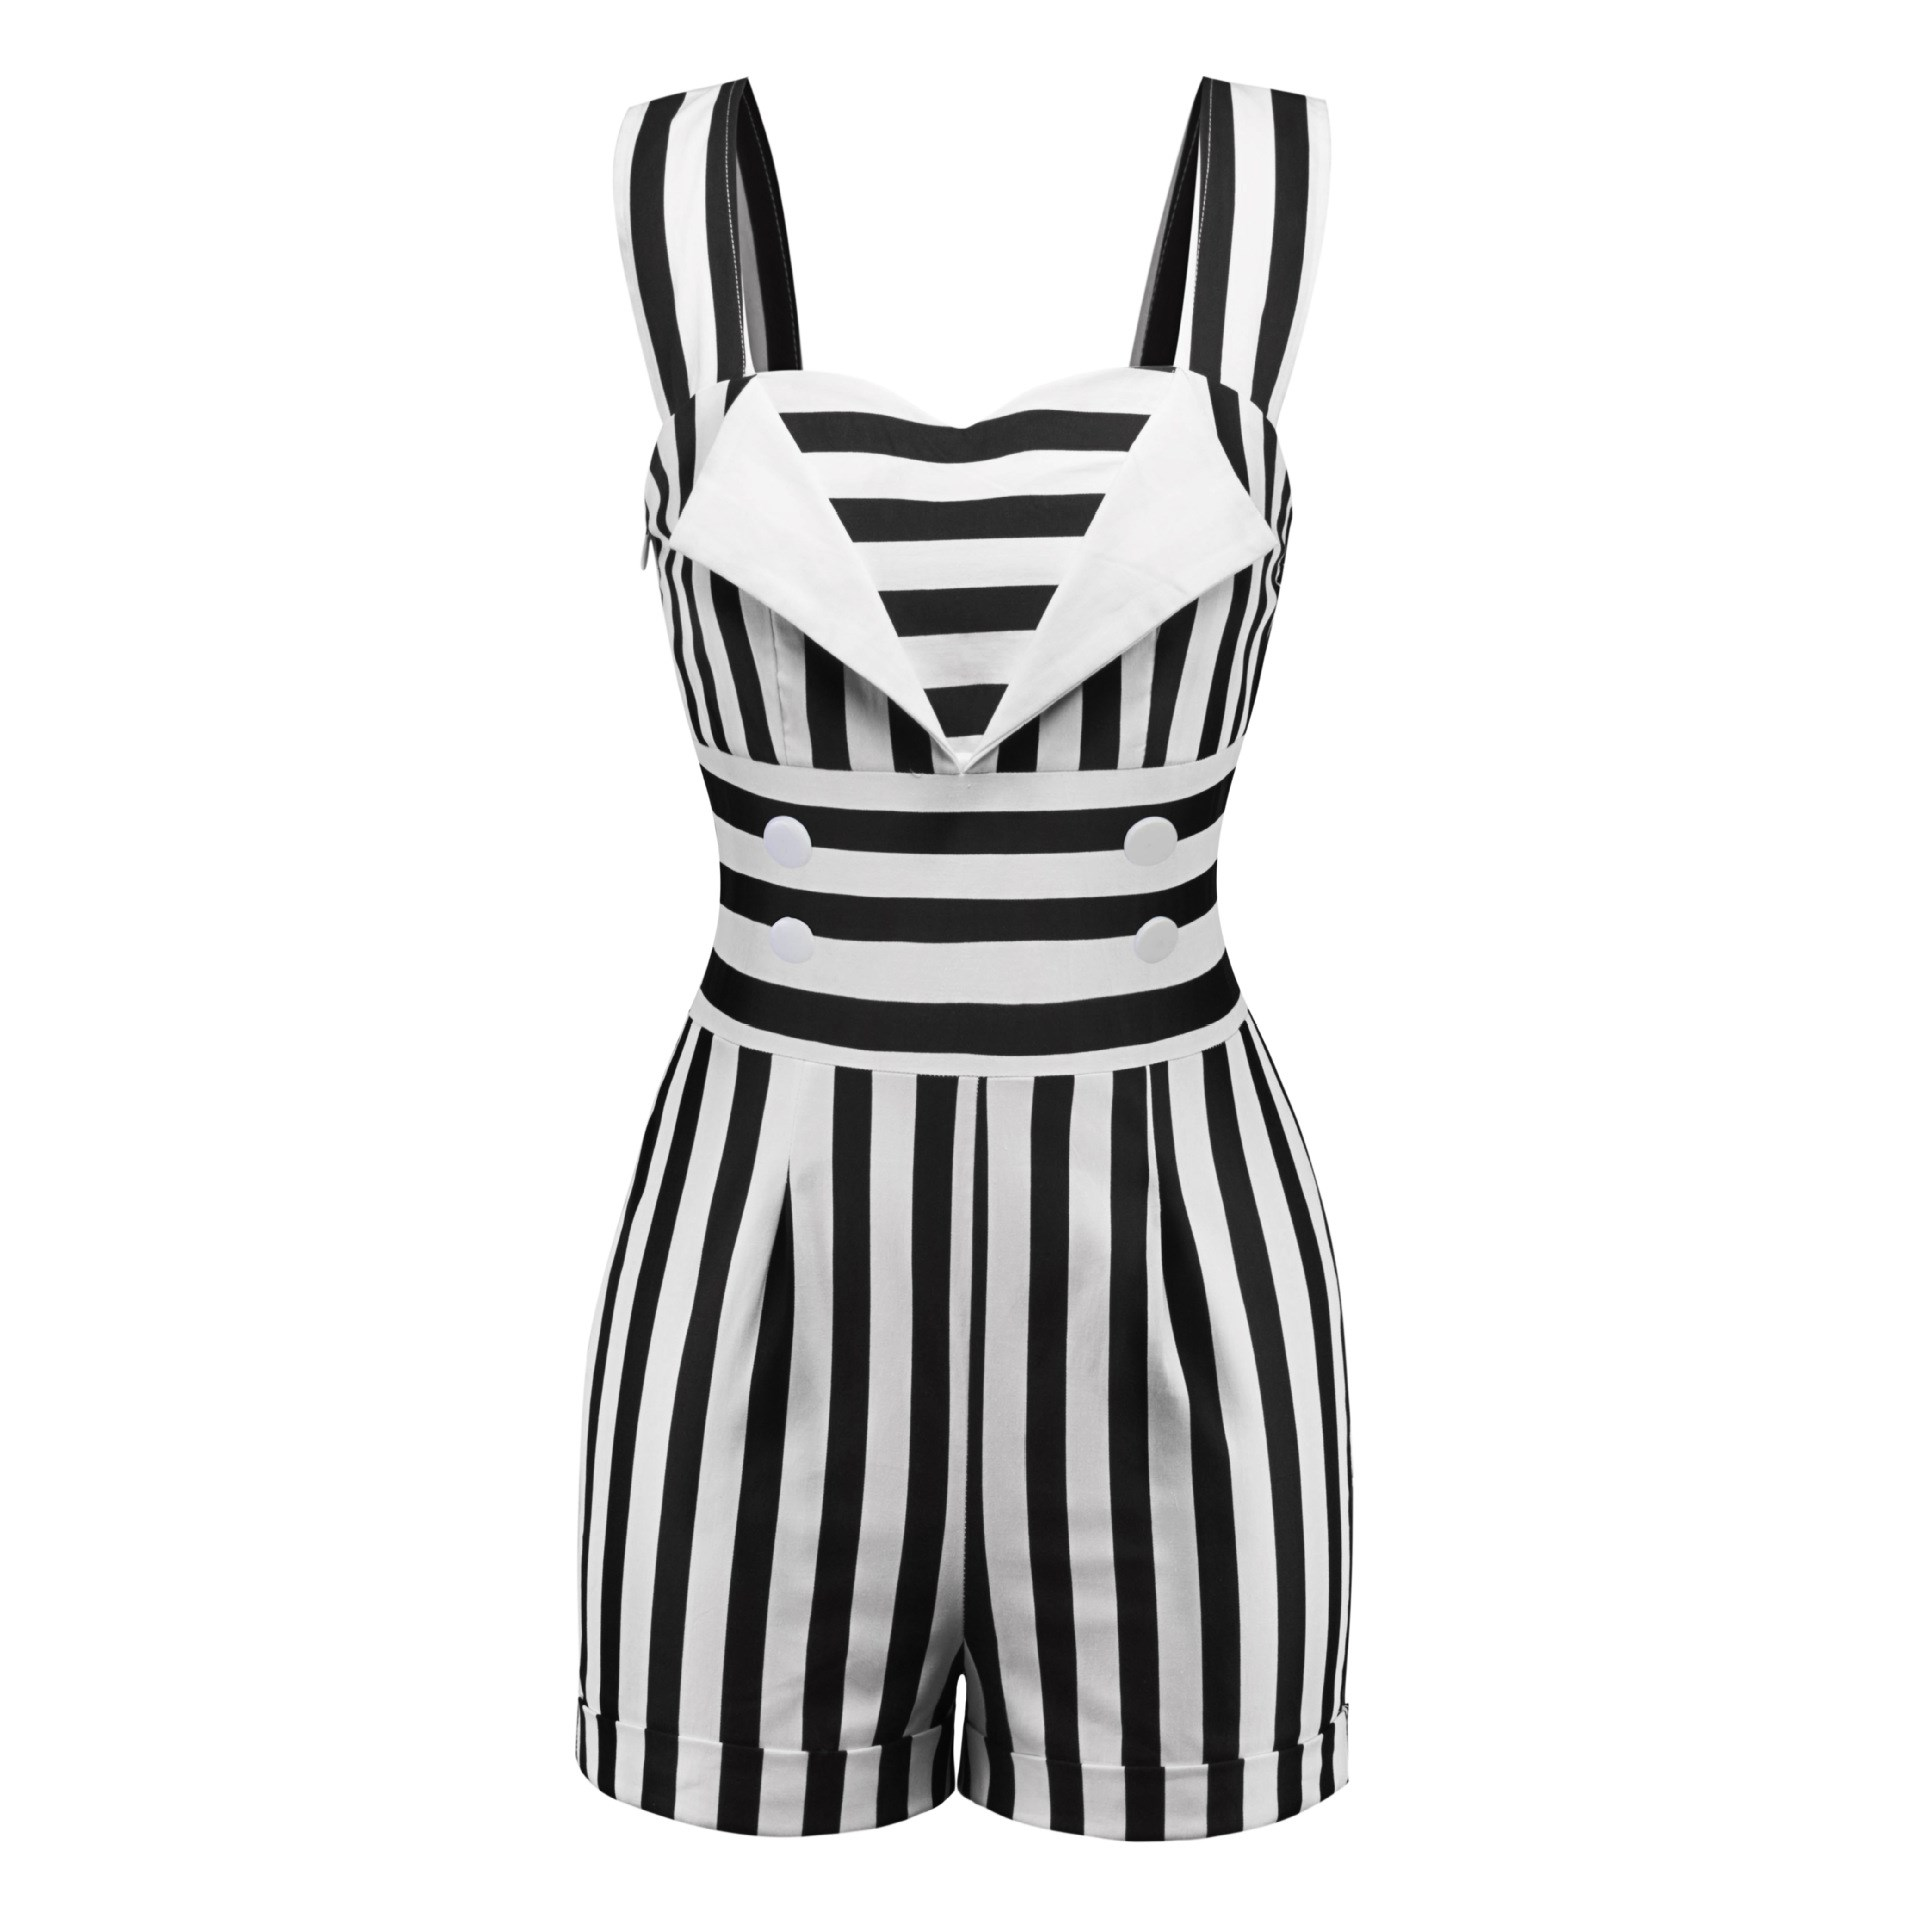 Stripes Retro Fashion Striped Sleeveless Romper Vintage Straps Button Jumpsuit Cotton 2019 Overalls Summer 6BT7nq7W